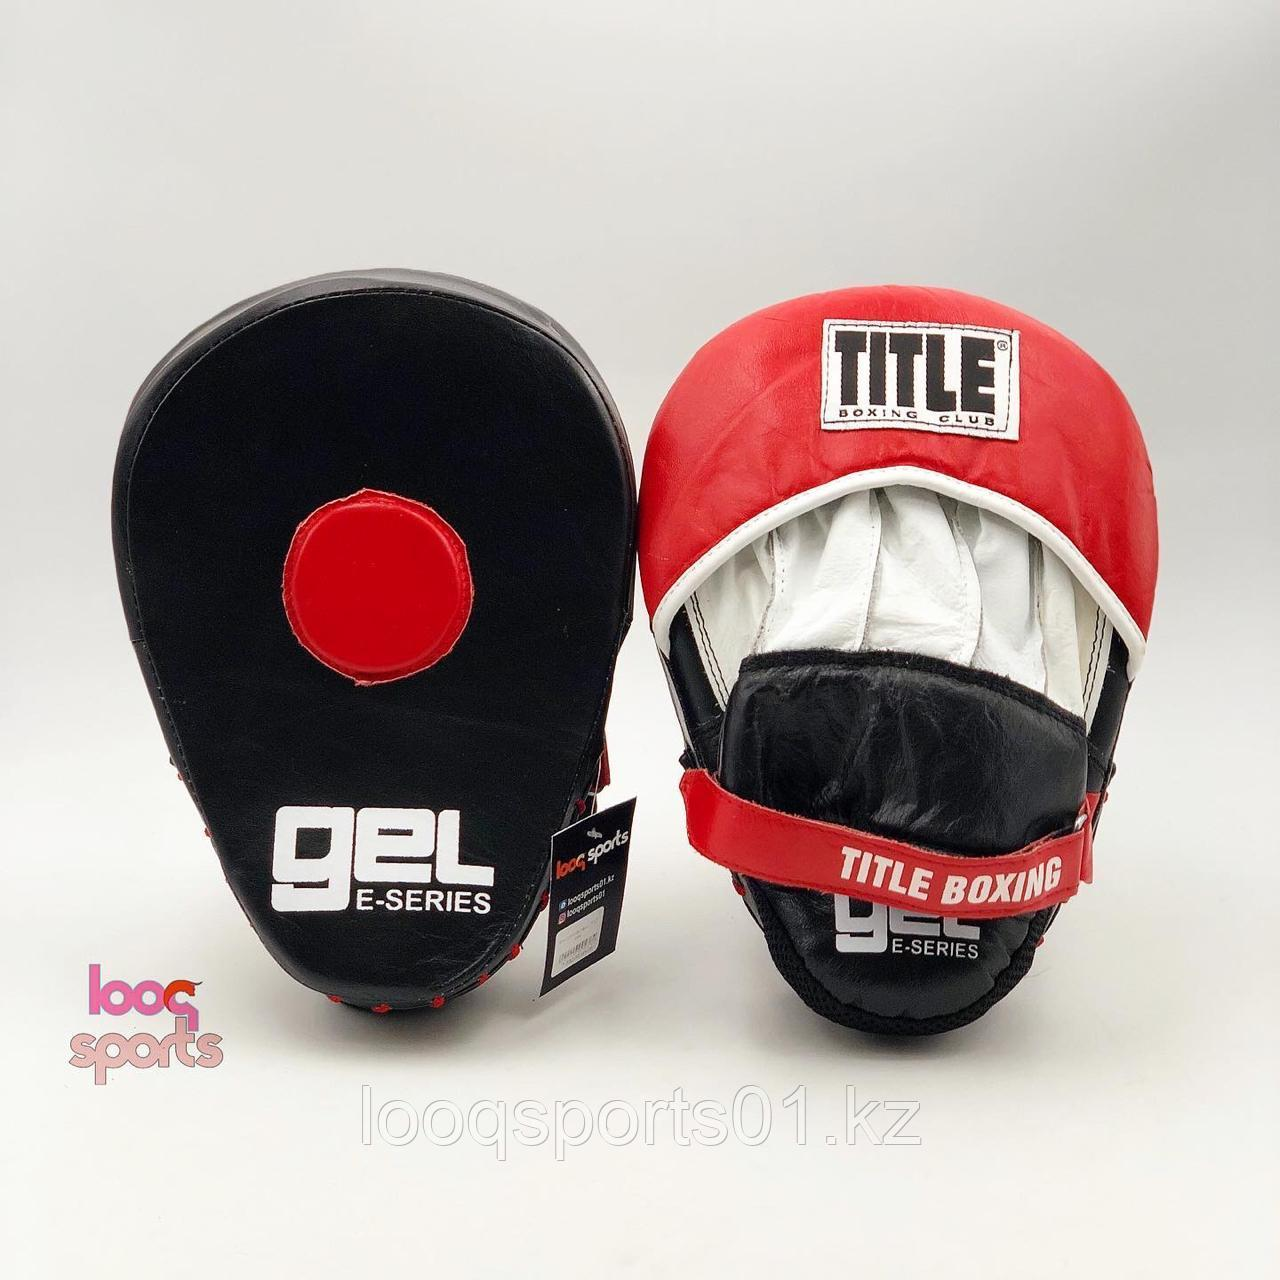 Боксерские лапы (кожа) TITLE